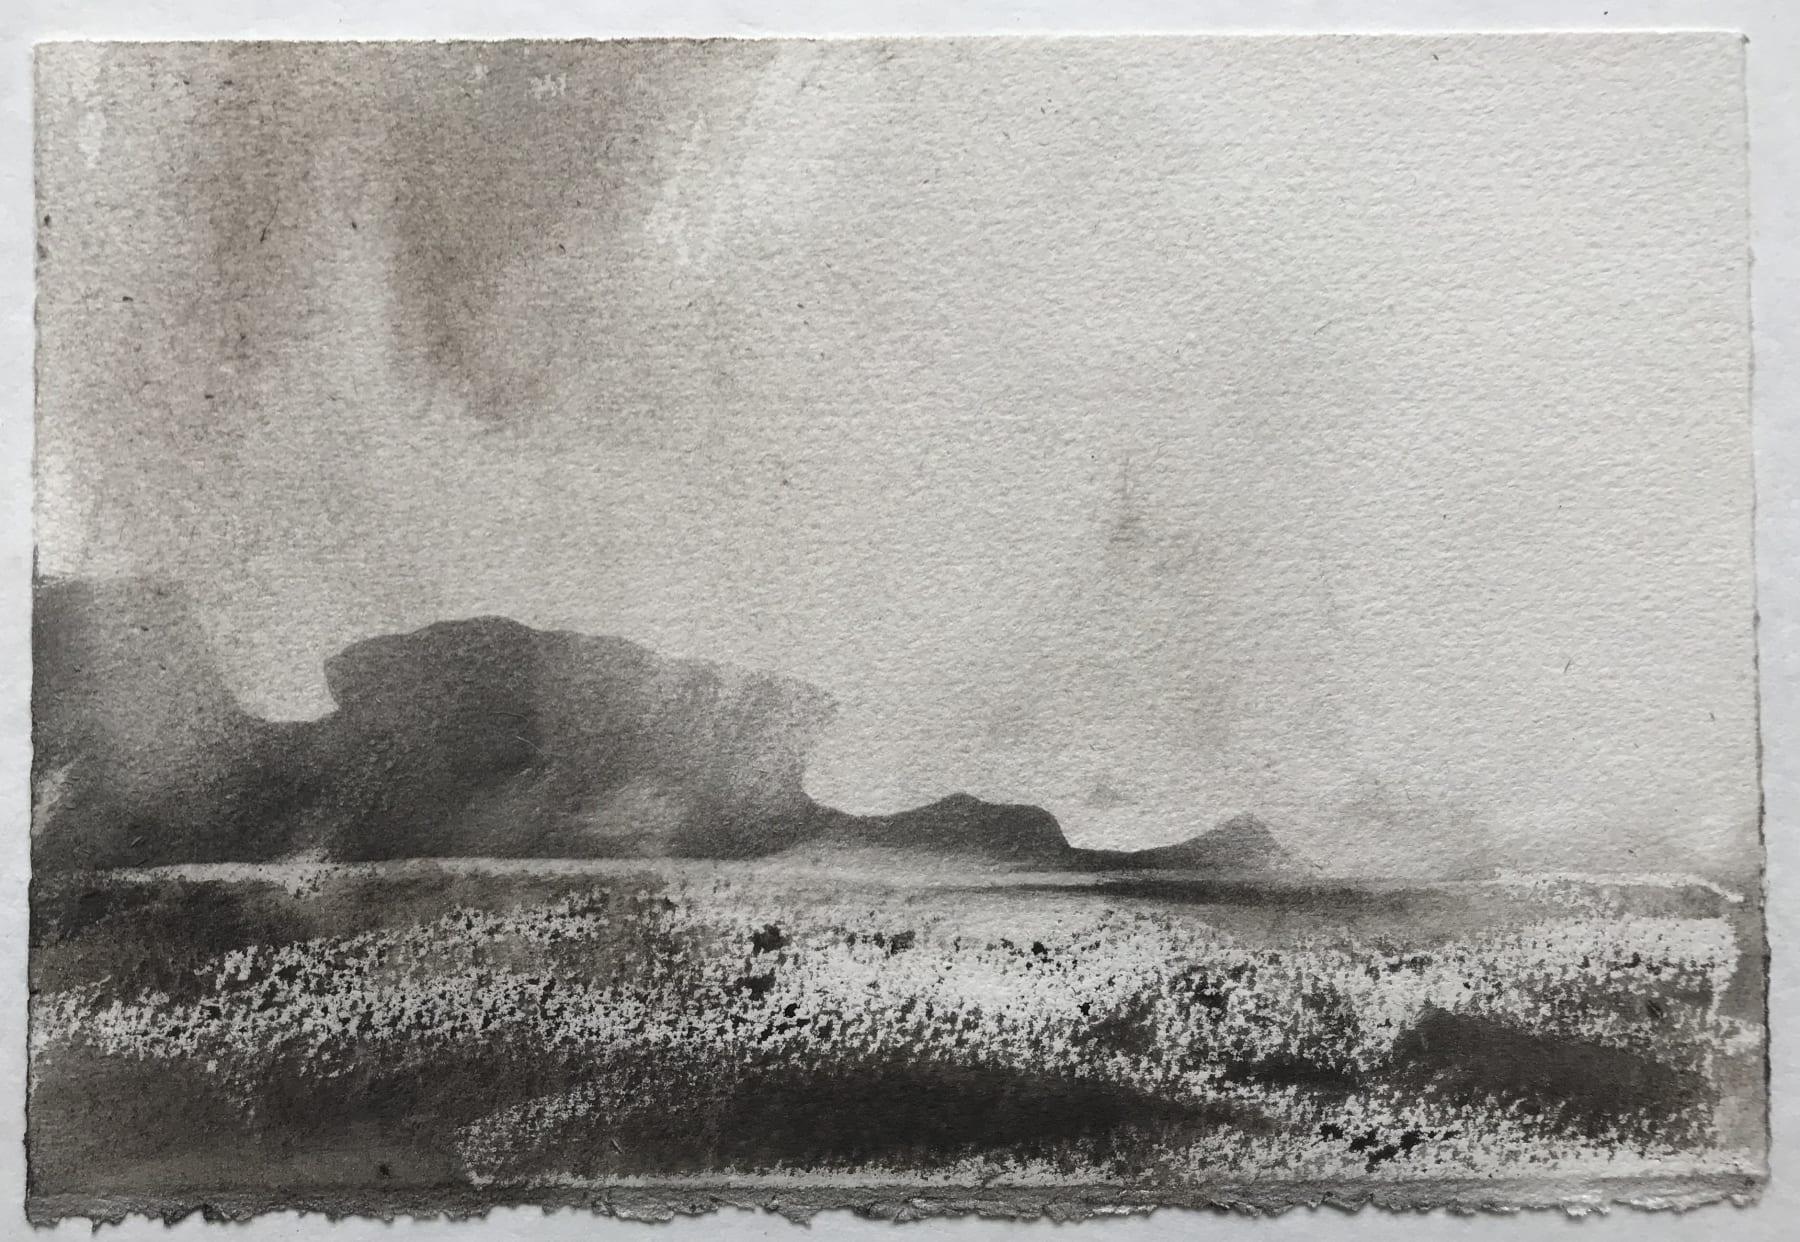 Jason Hicklin, West Tump, Grassholm Island, 2020